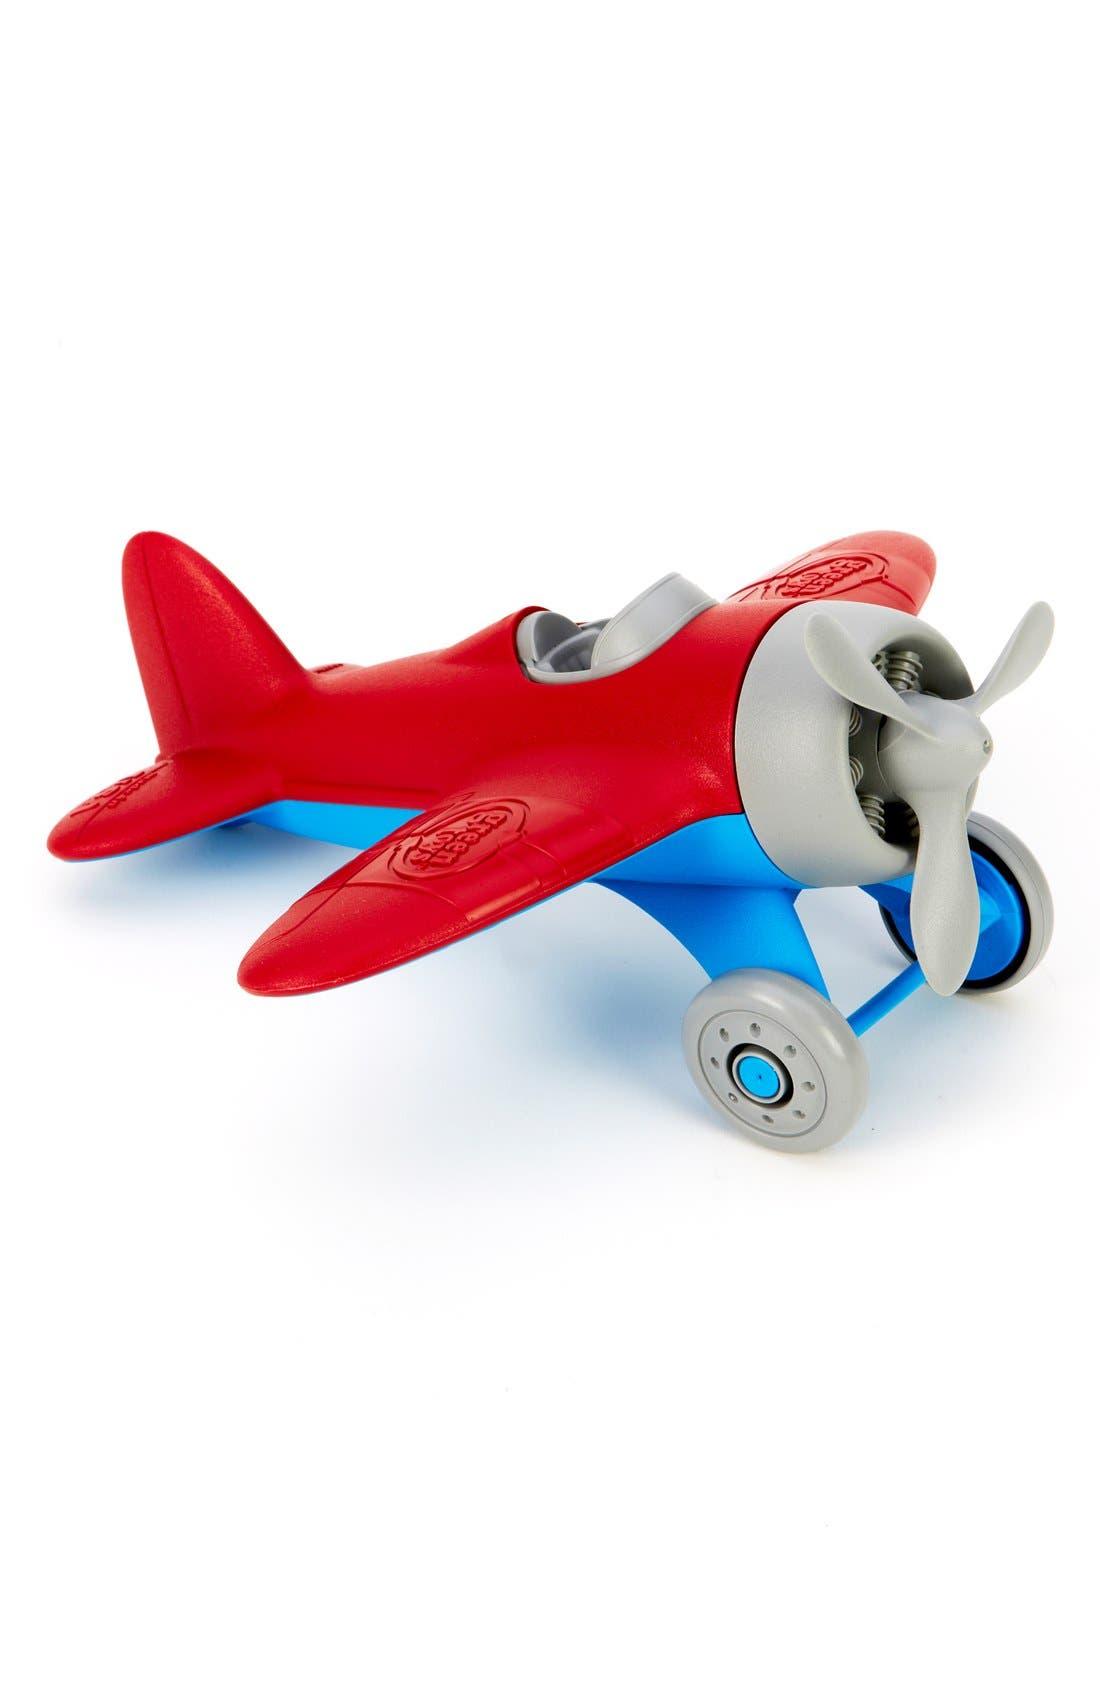 Main Image - Green Toys Airplane